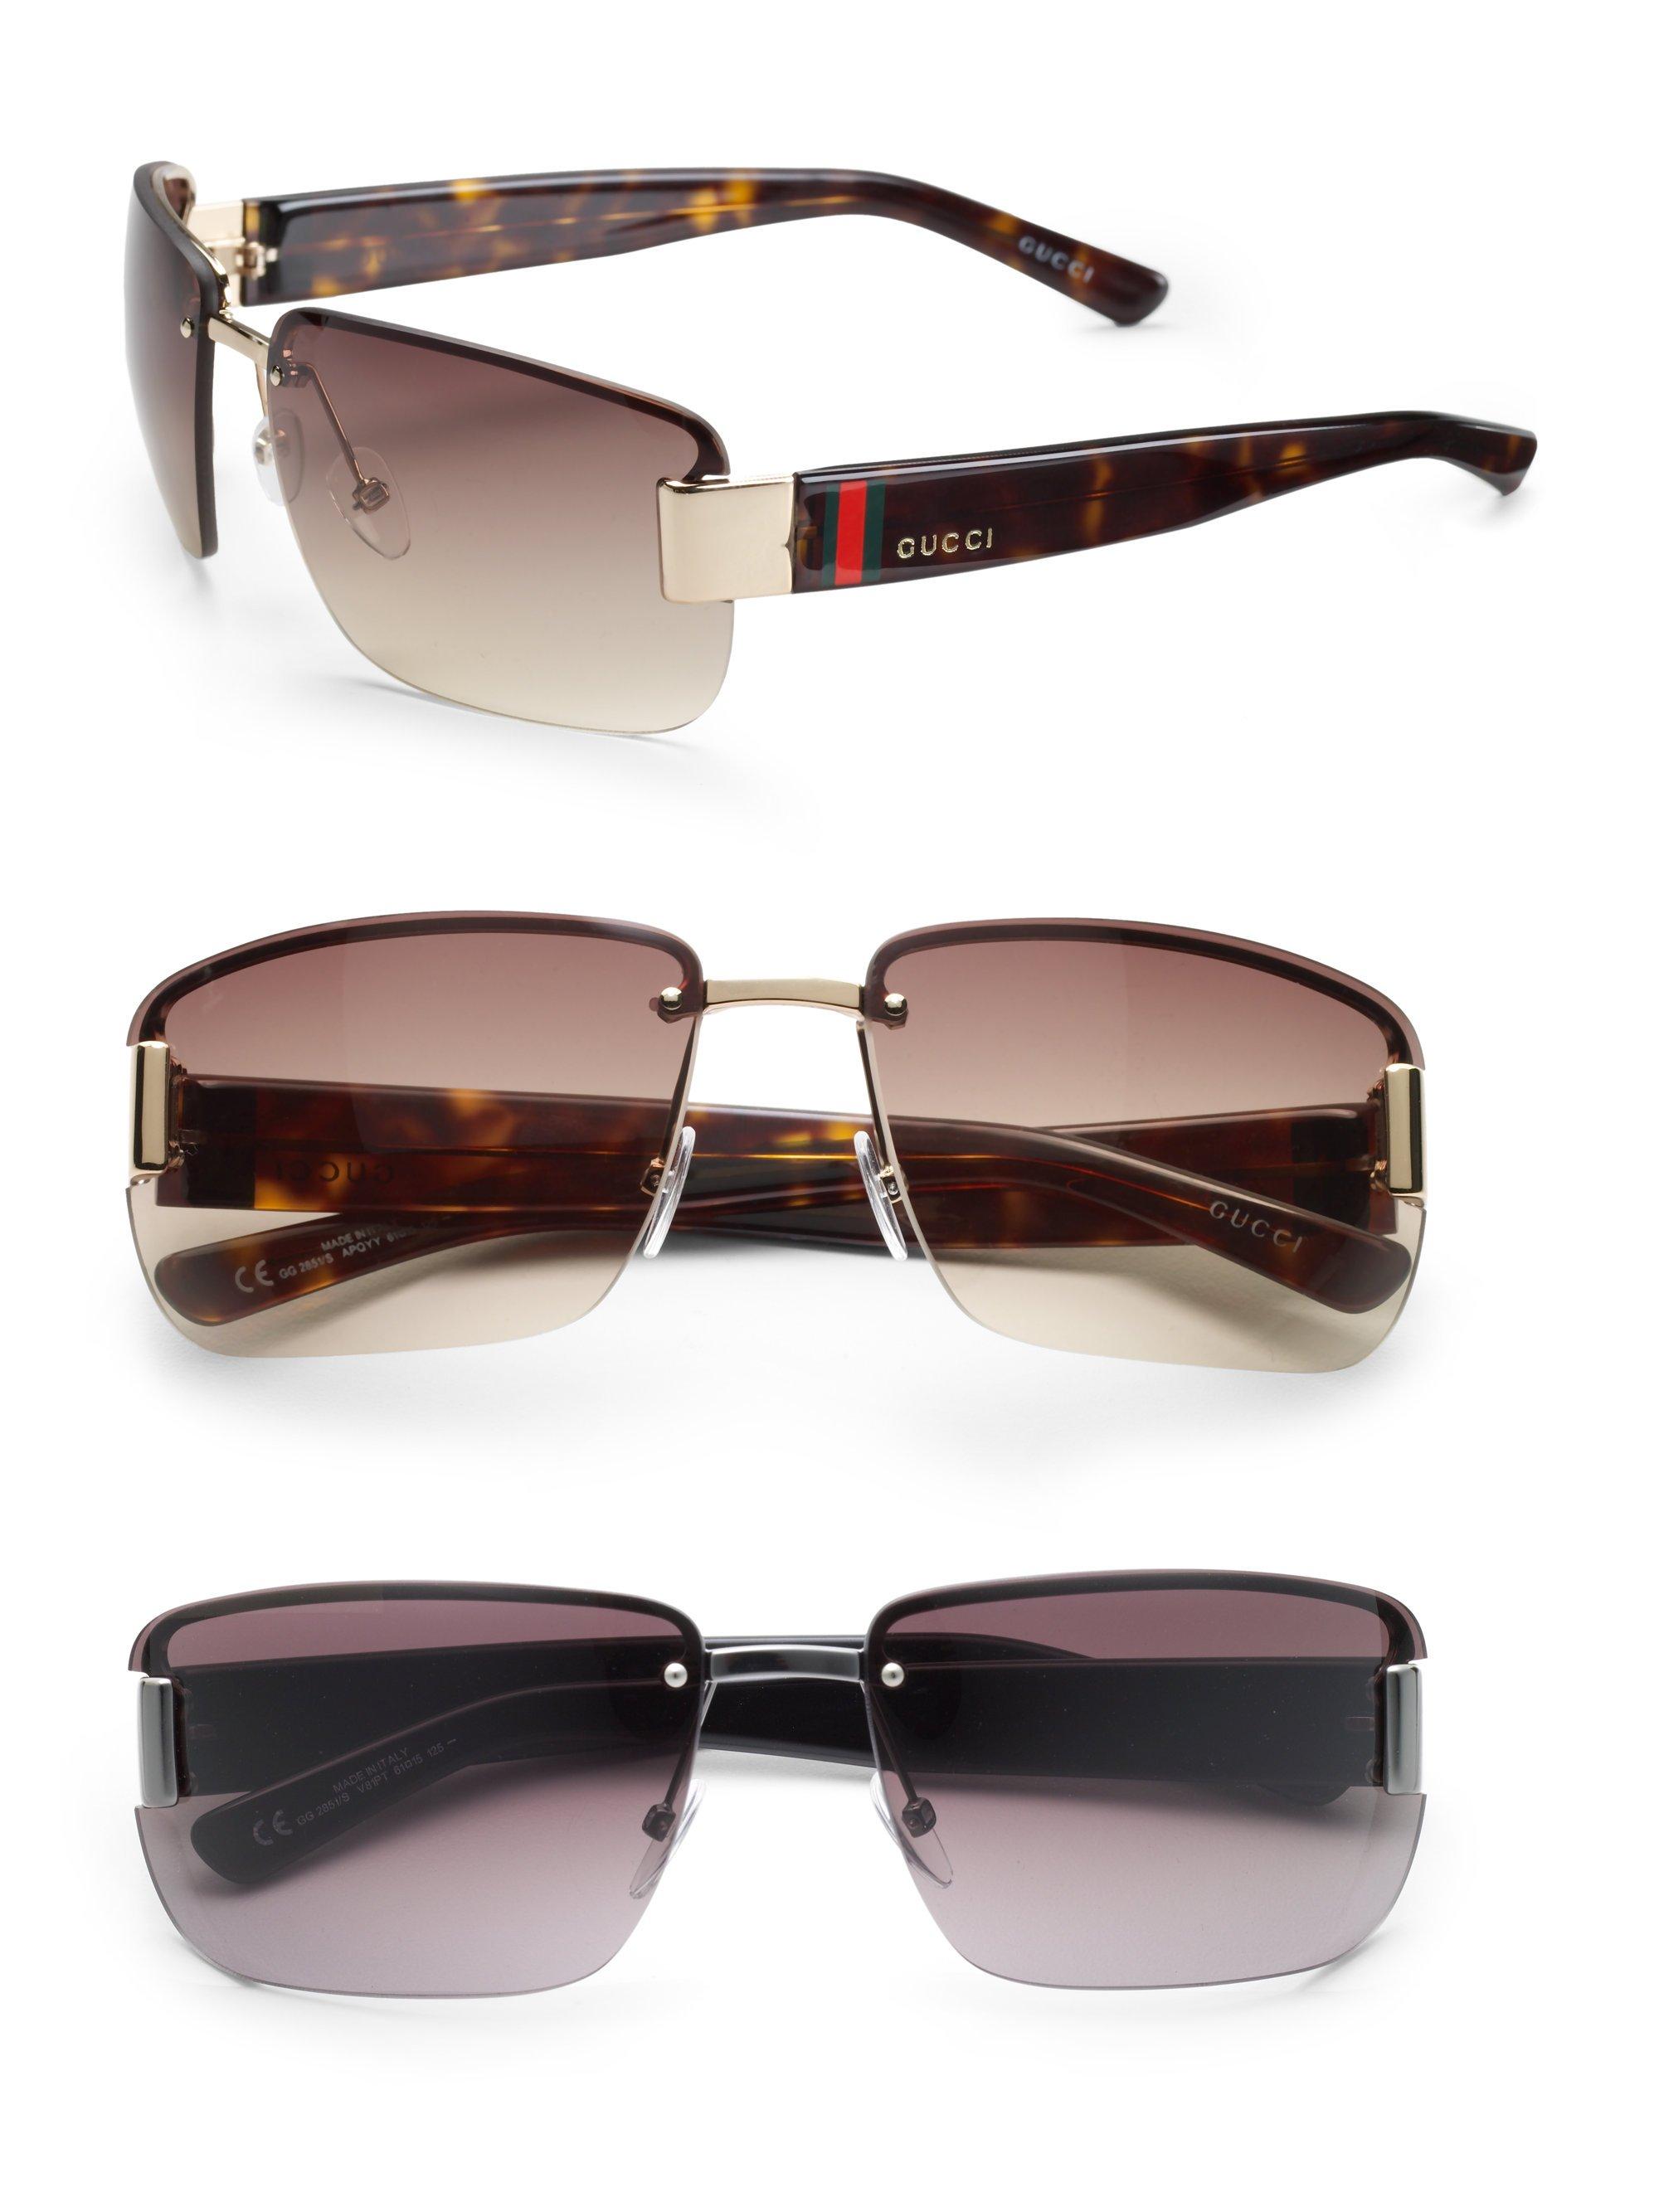 7193f28dee Attractive Gucci Frames Men Pattern - Frames Ideas Handmade ...